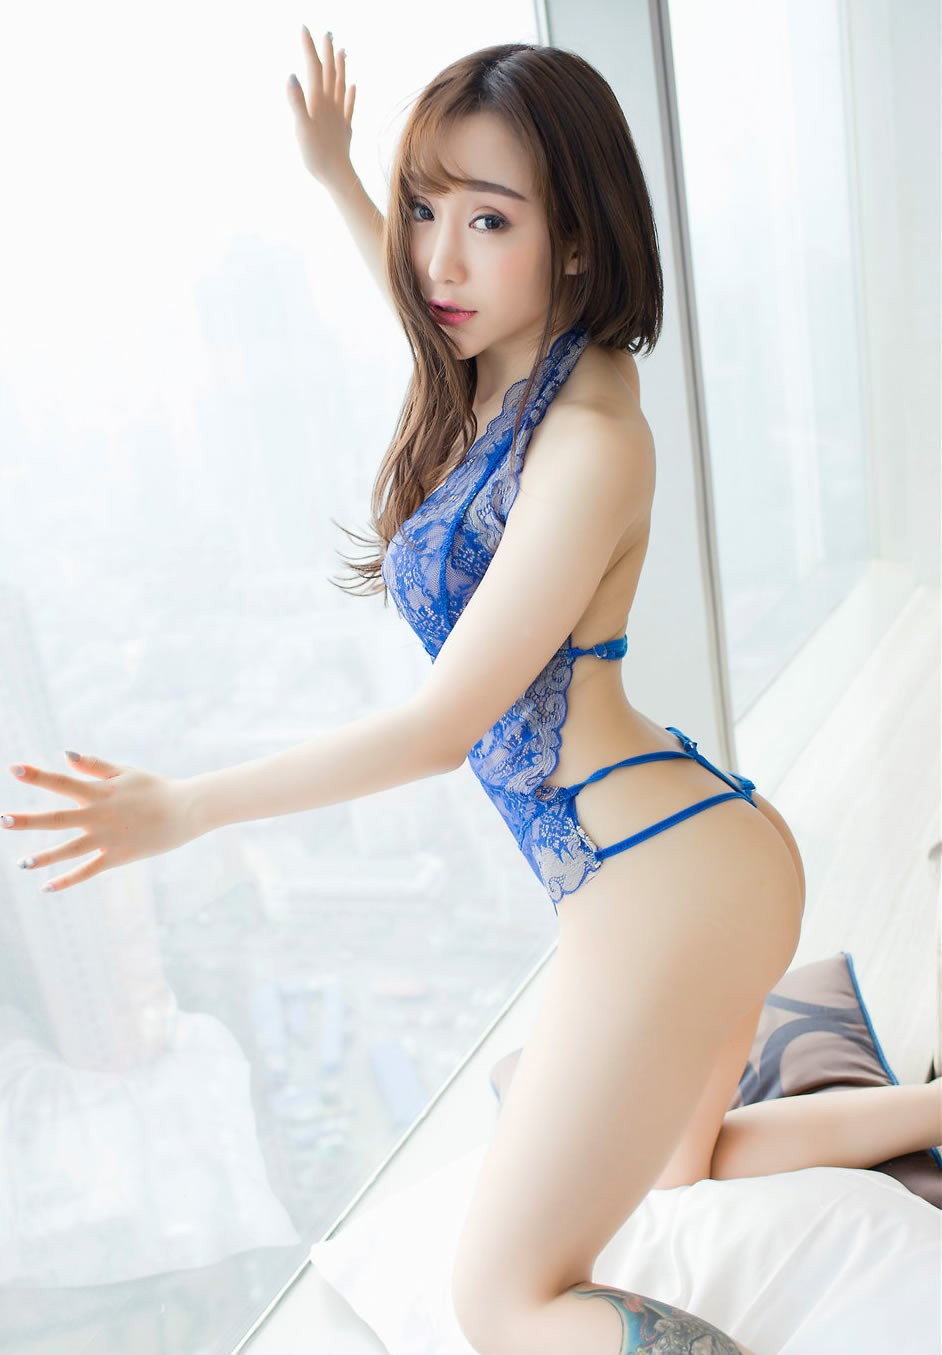 🌸🌸🌸🌸 REAL 🌸OUTCALL🌸Beautiful Asian Girl Bella 🌸 202-759-7915🌸🌸🌸🌸